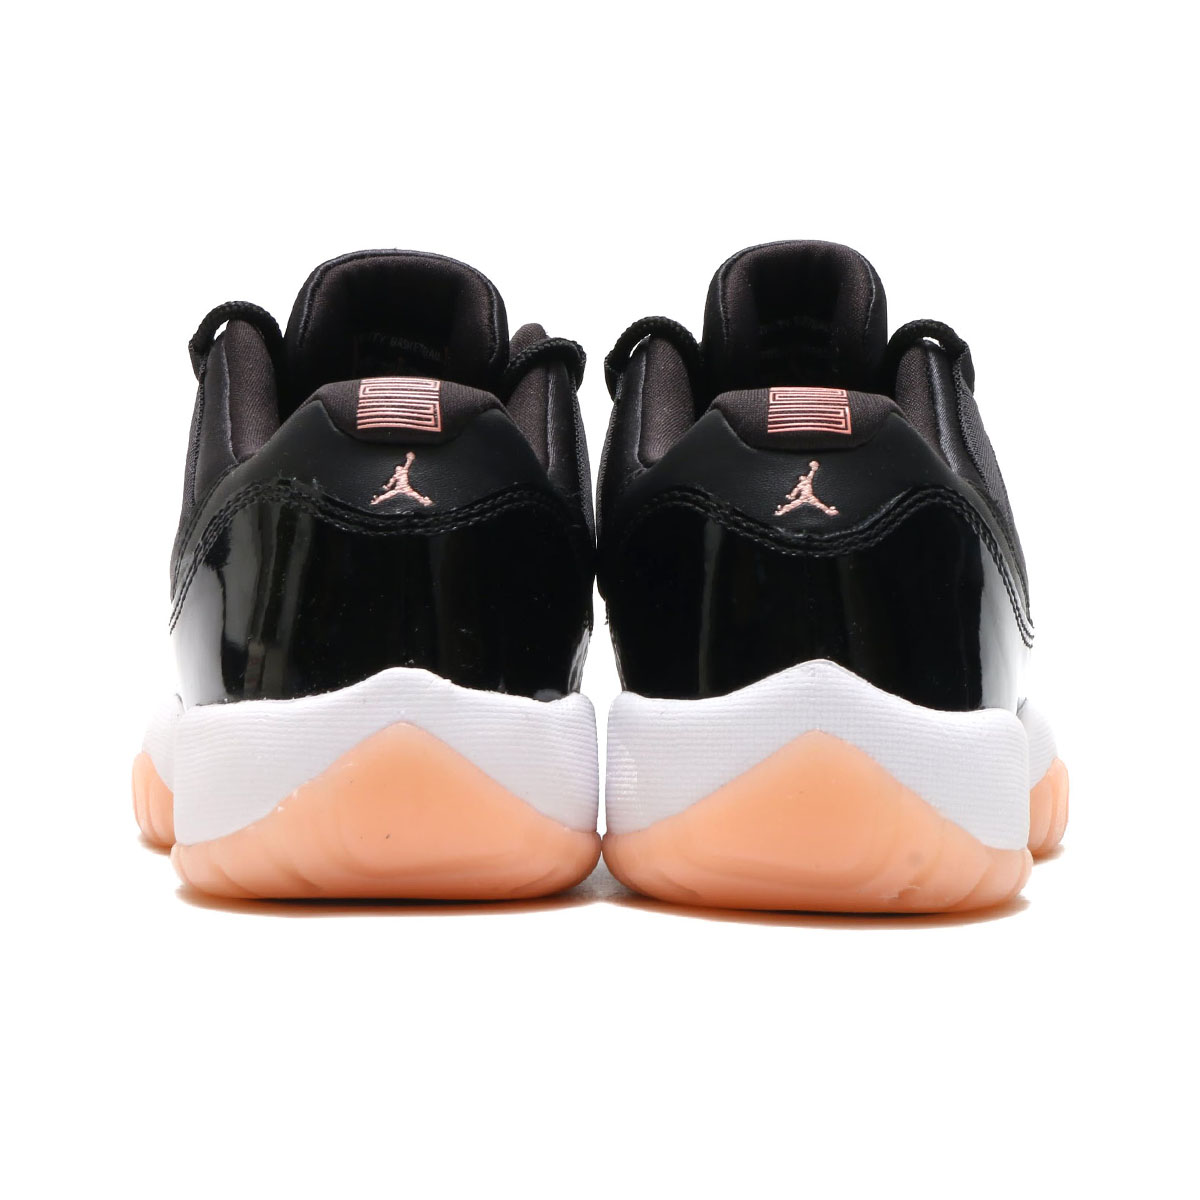 d5462662 NIKE AIR JORDAN 11 RETRO LOW GG (Nike Air Jordan 11 nostalgic low GG)  (BLACK/BLEACHED CORAL-WHITE) 18SU-S